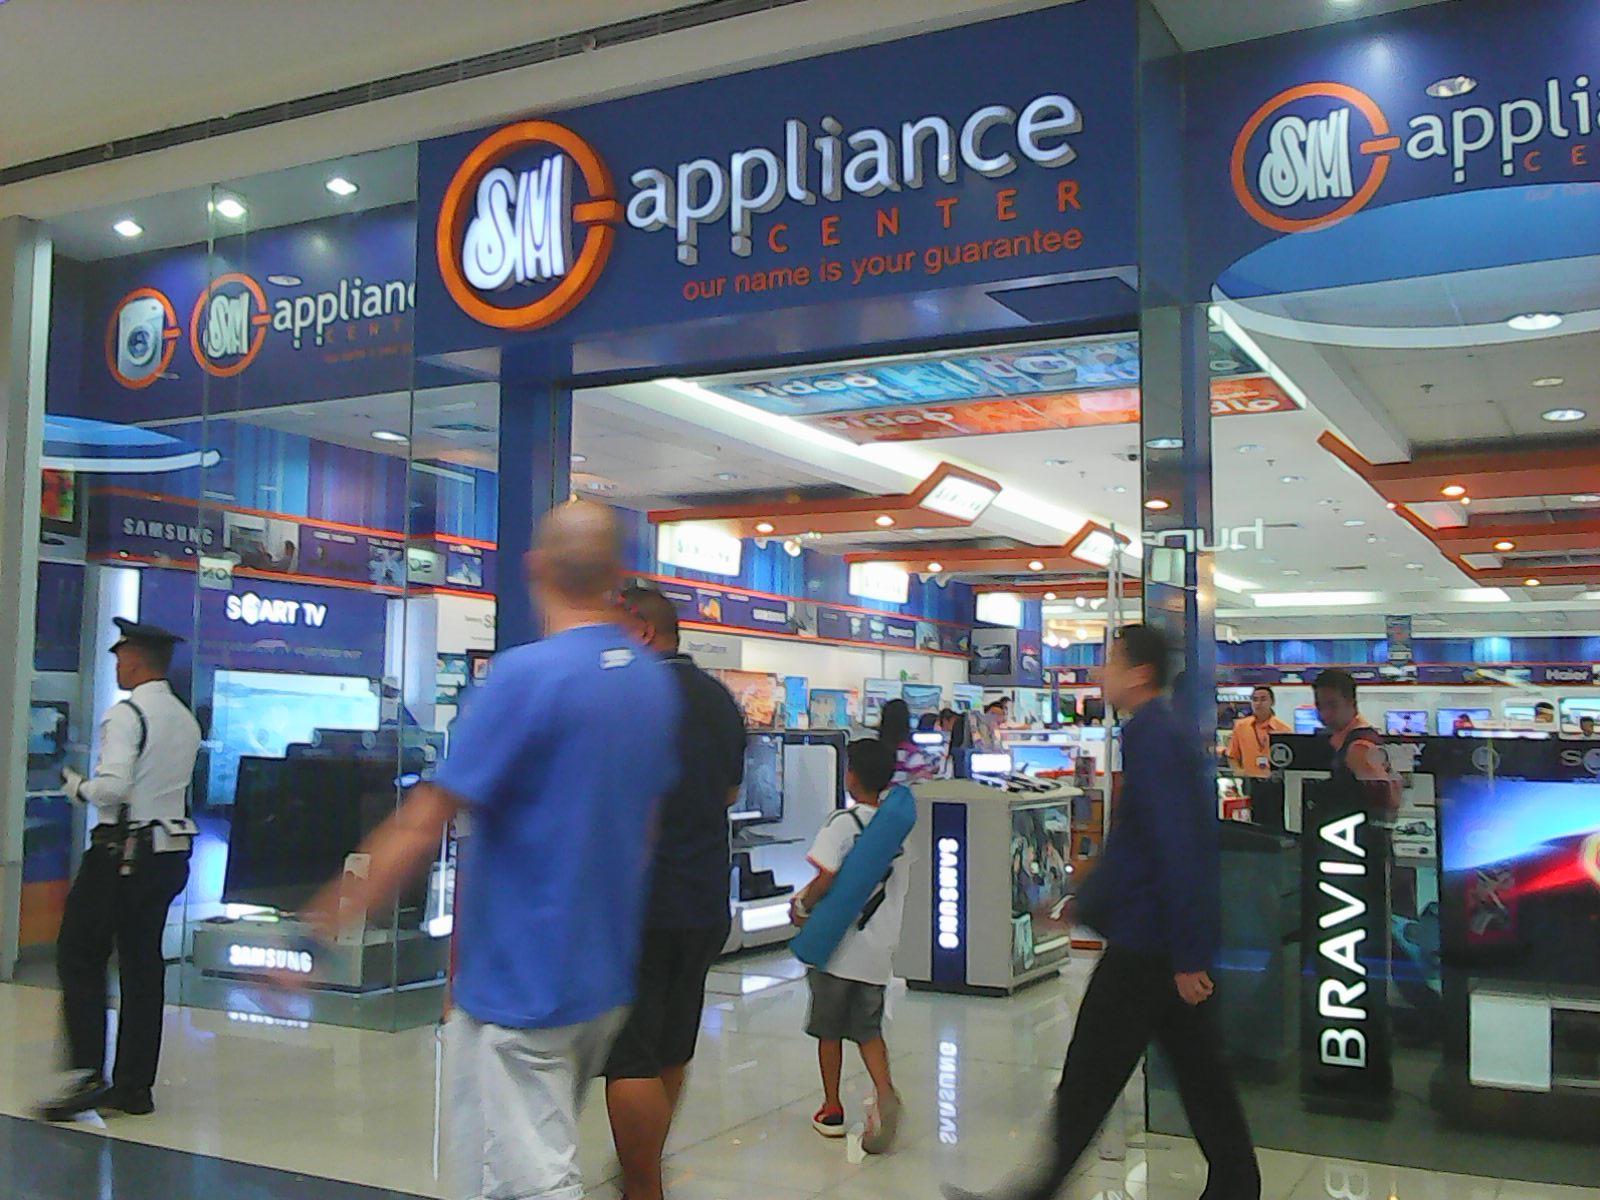 sm kitchen appliances resurface countertops appliance center at